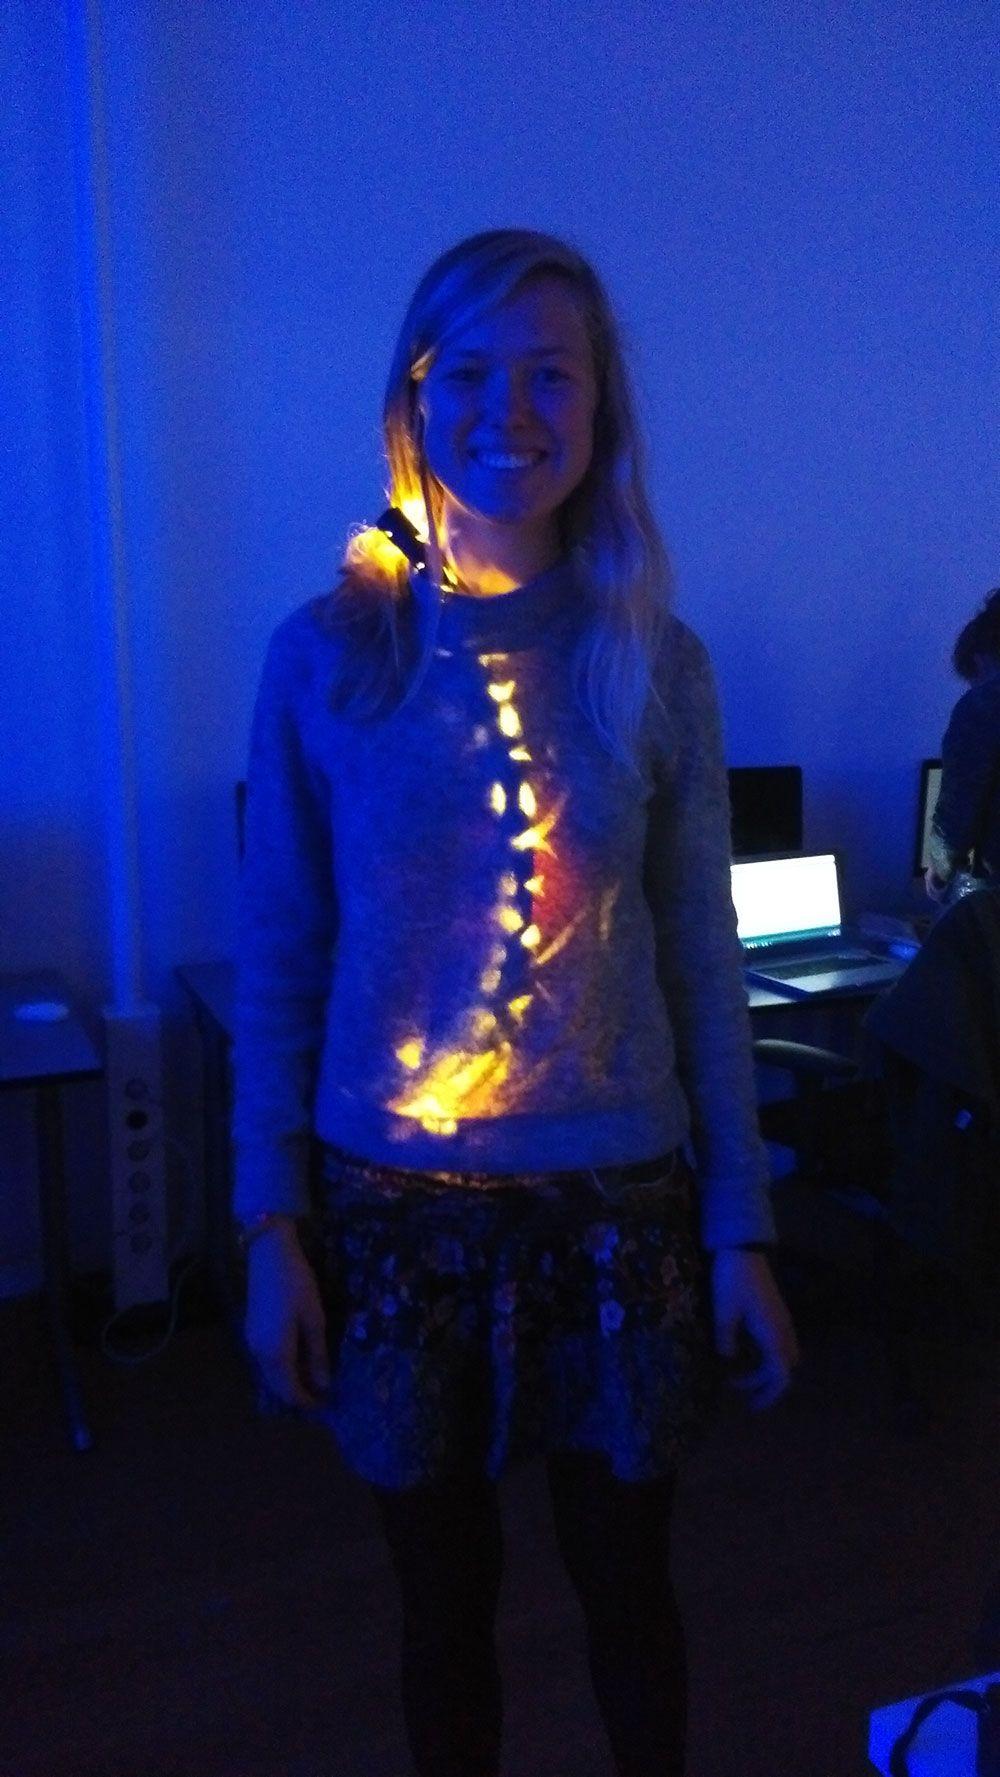 LIGHT MATERIAL EXPERIMENTS - Siri Wirtensohn